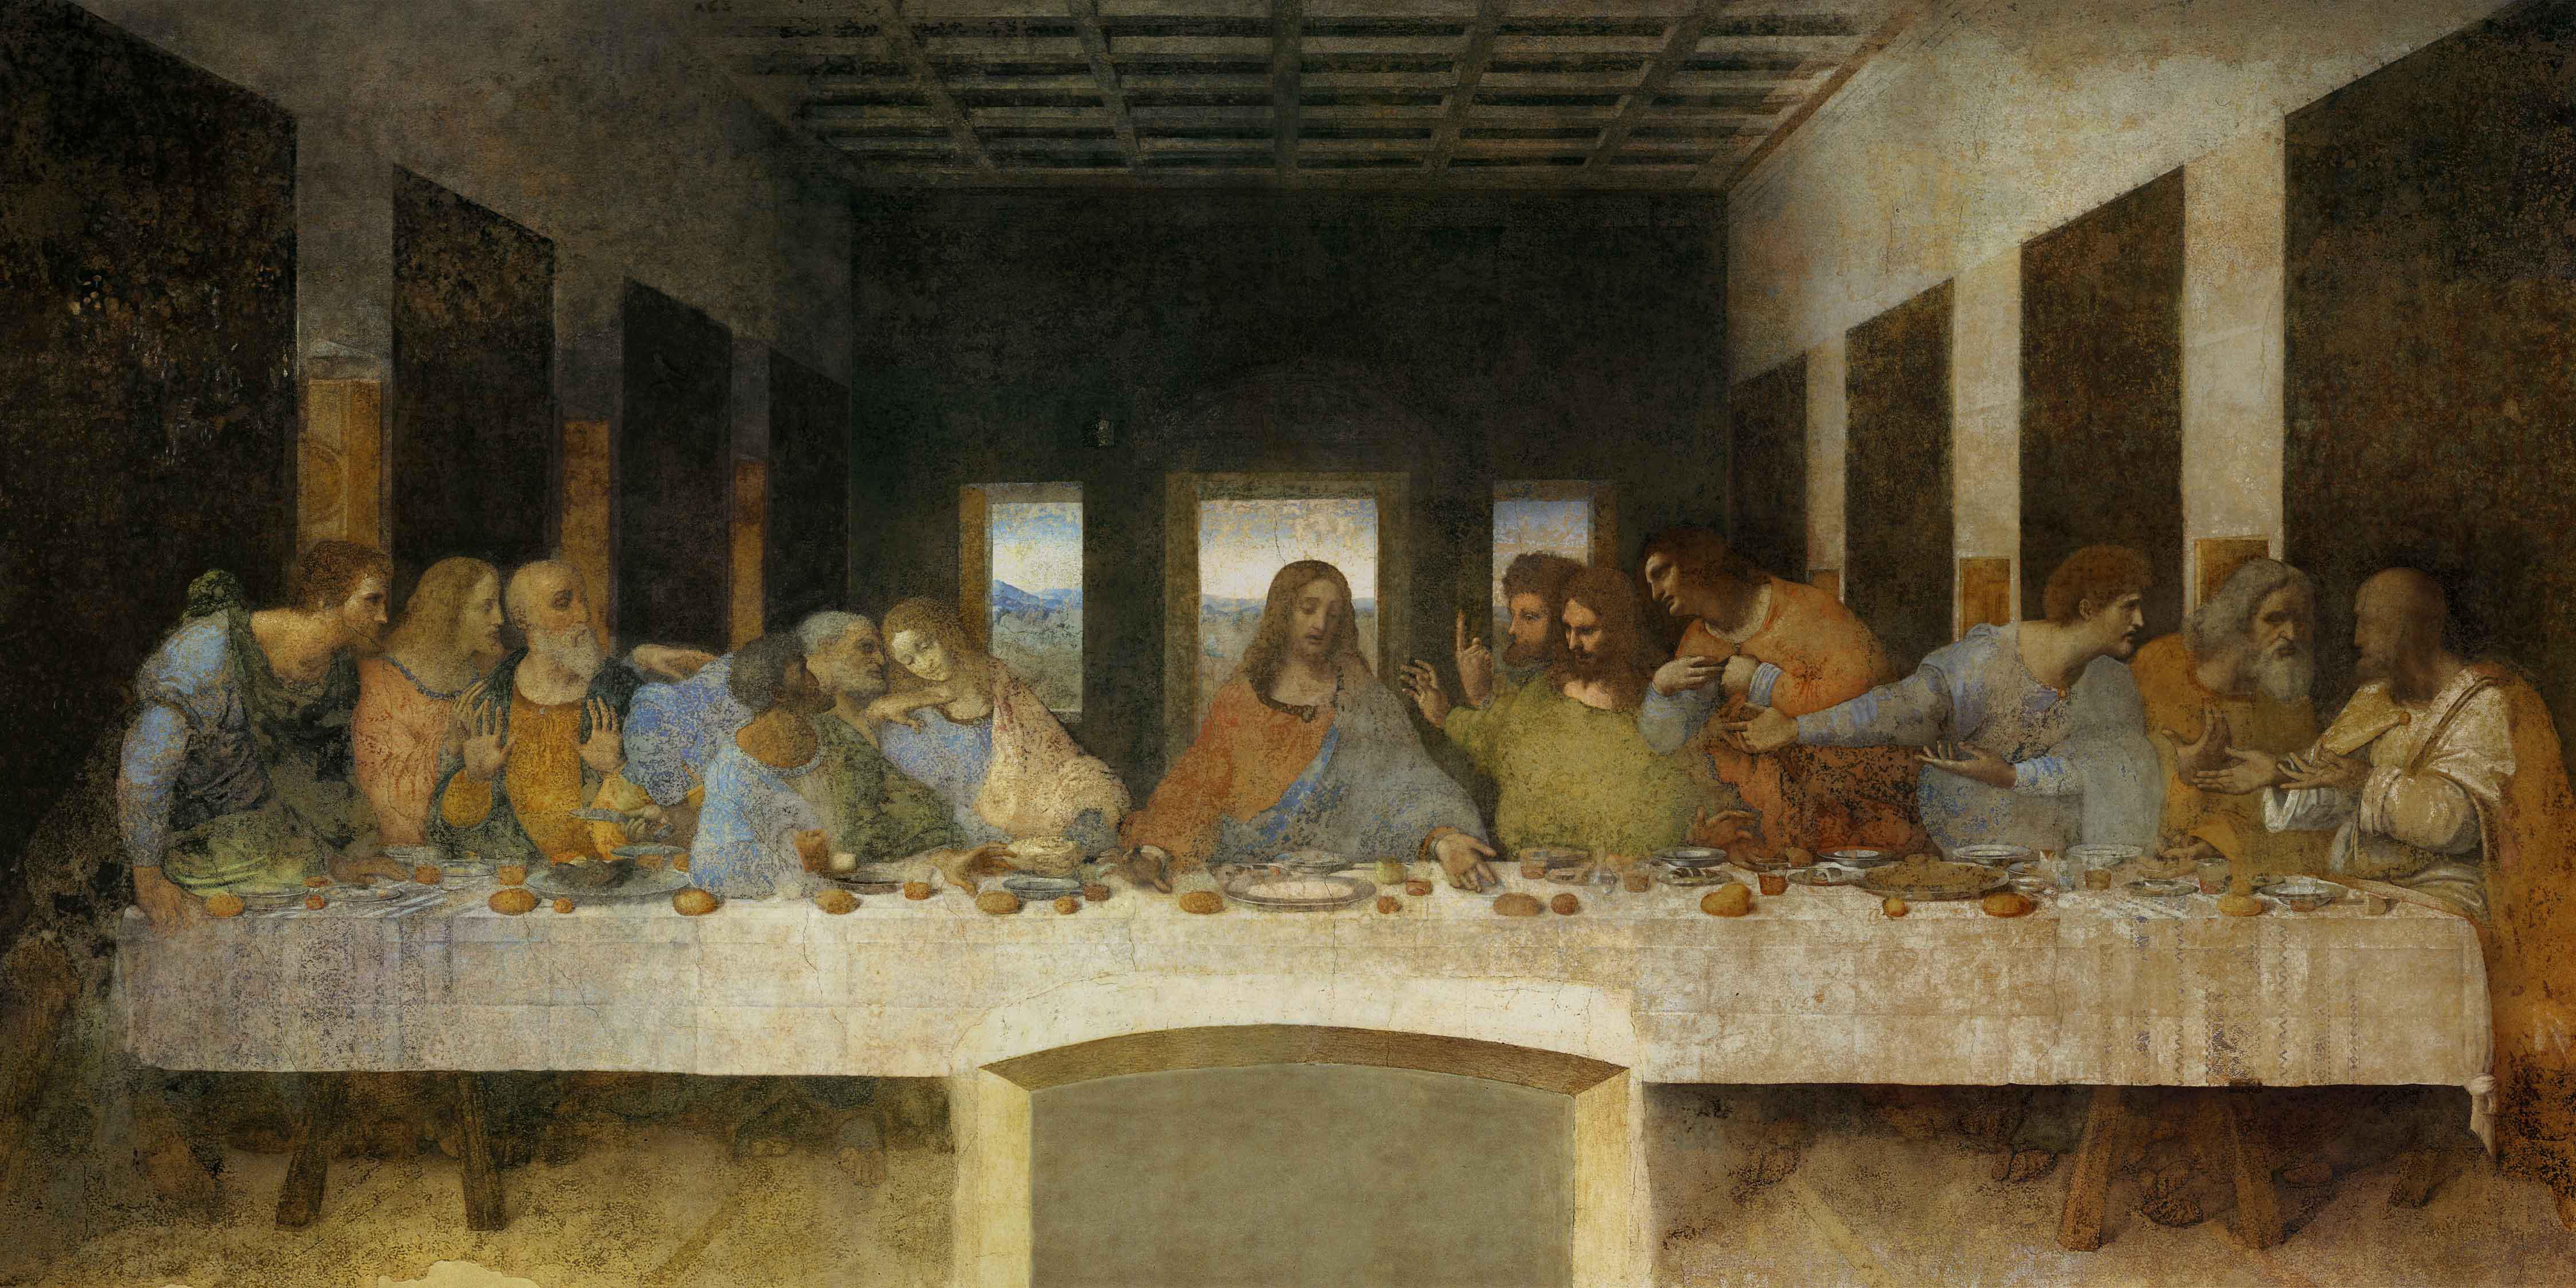 File:TheLastSupper.jpg - Wikimedia Commons Da Vinci Last Supper Original